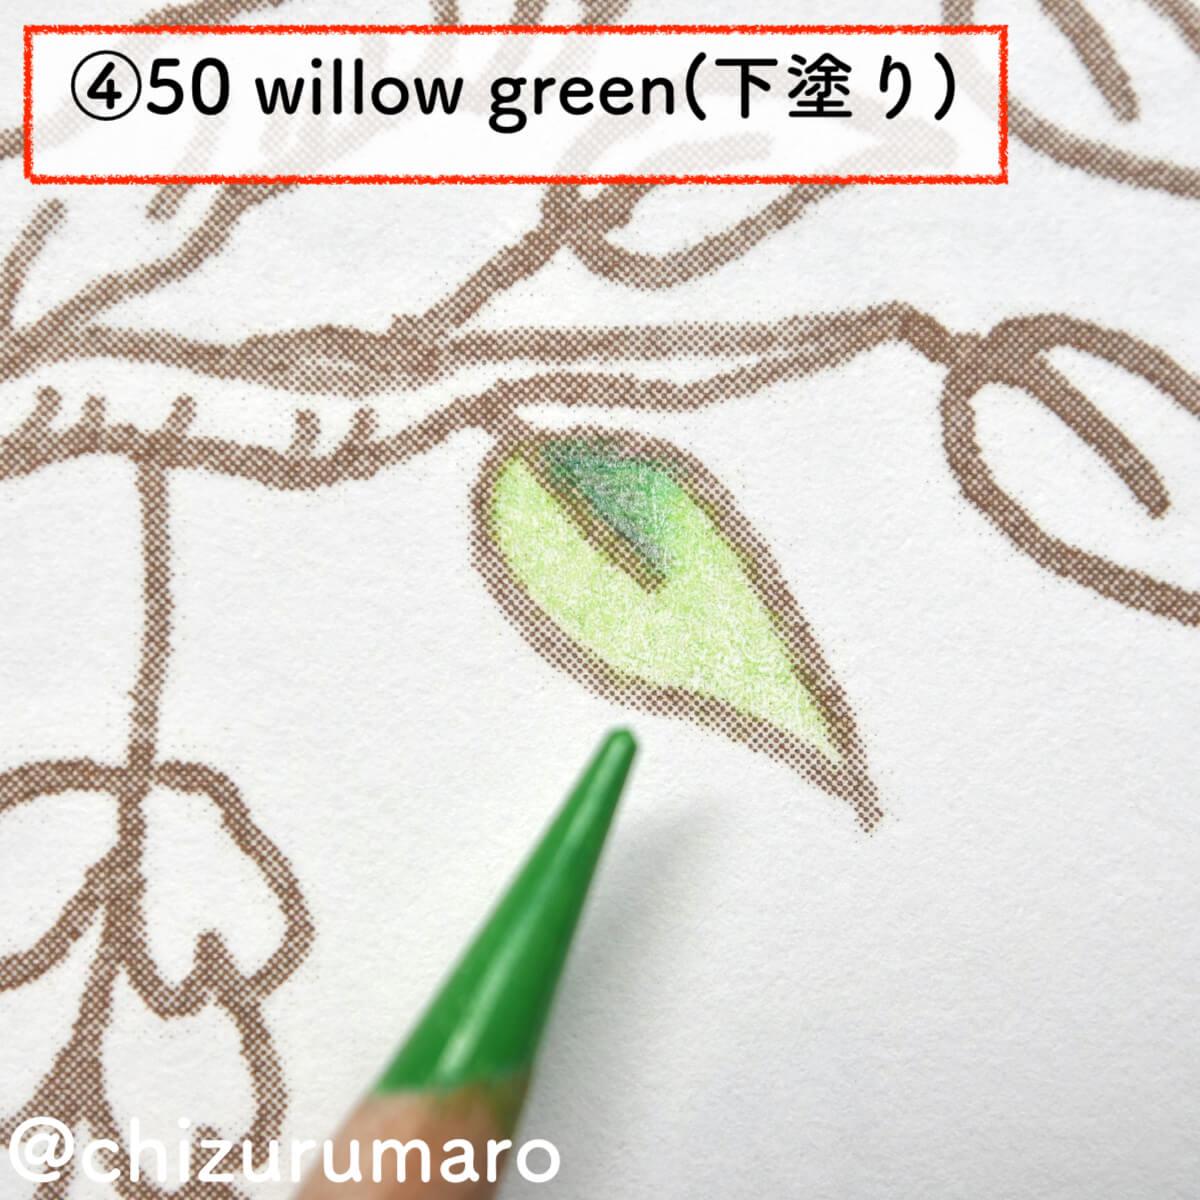 f:id:chizurumaro:20201105212618j:plain